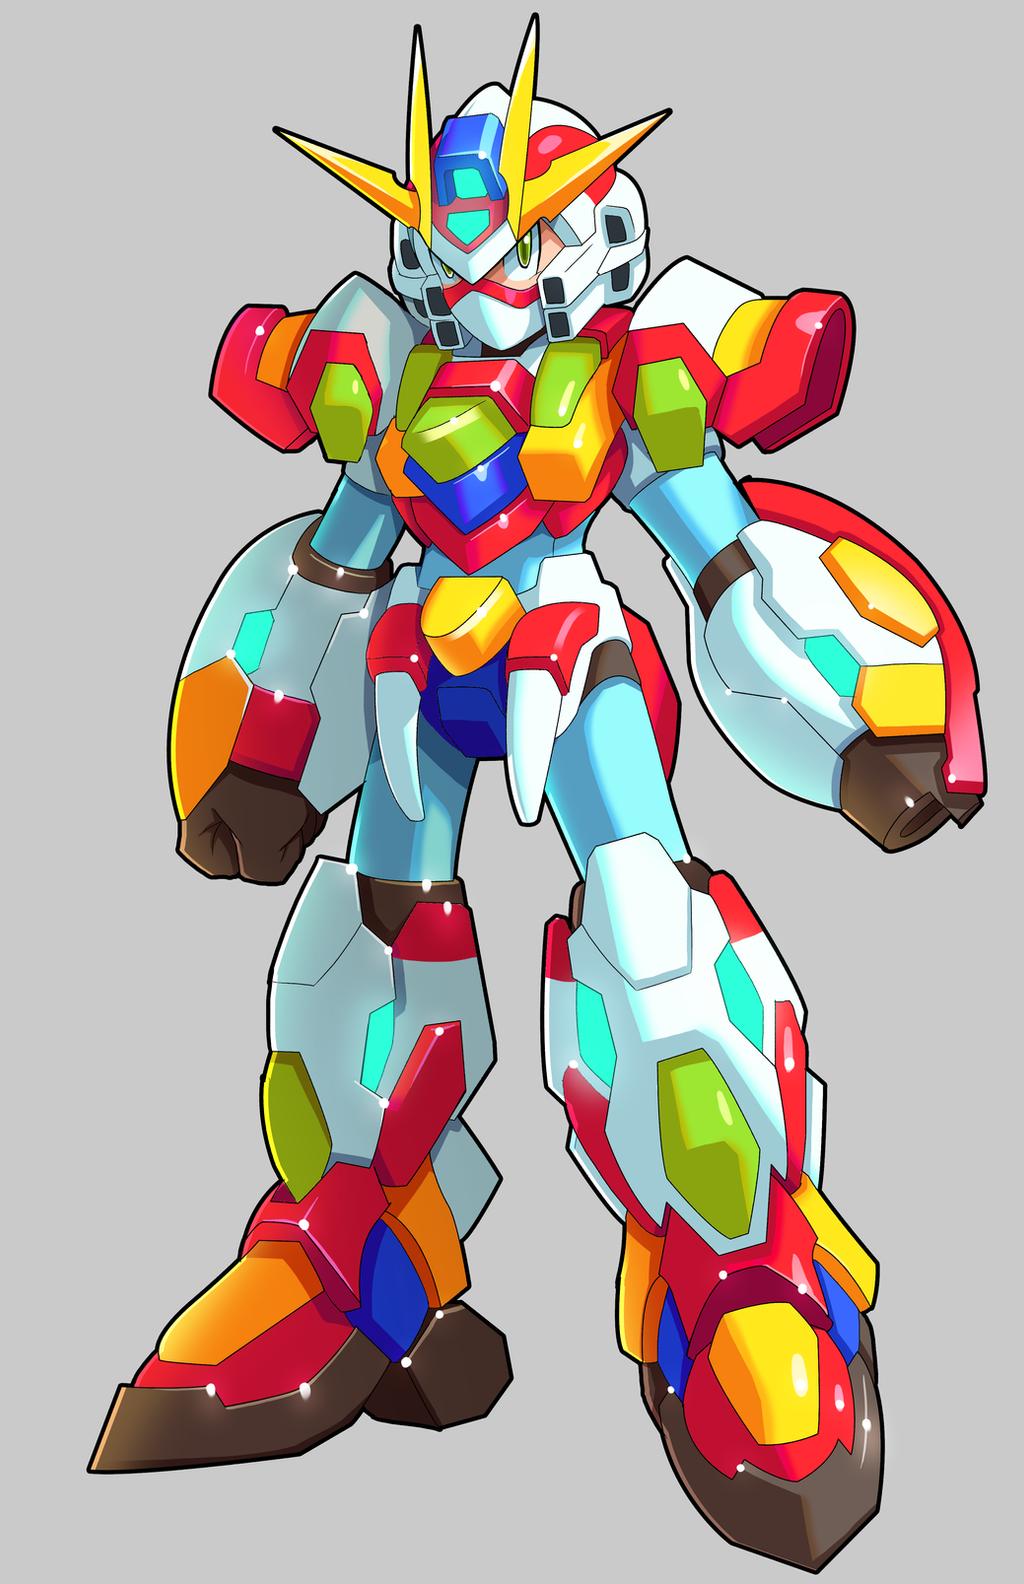 Mega Man X - (Fusion) - Burning Mirai Gundam by V-a-a-N